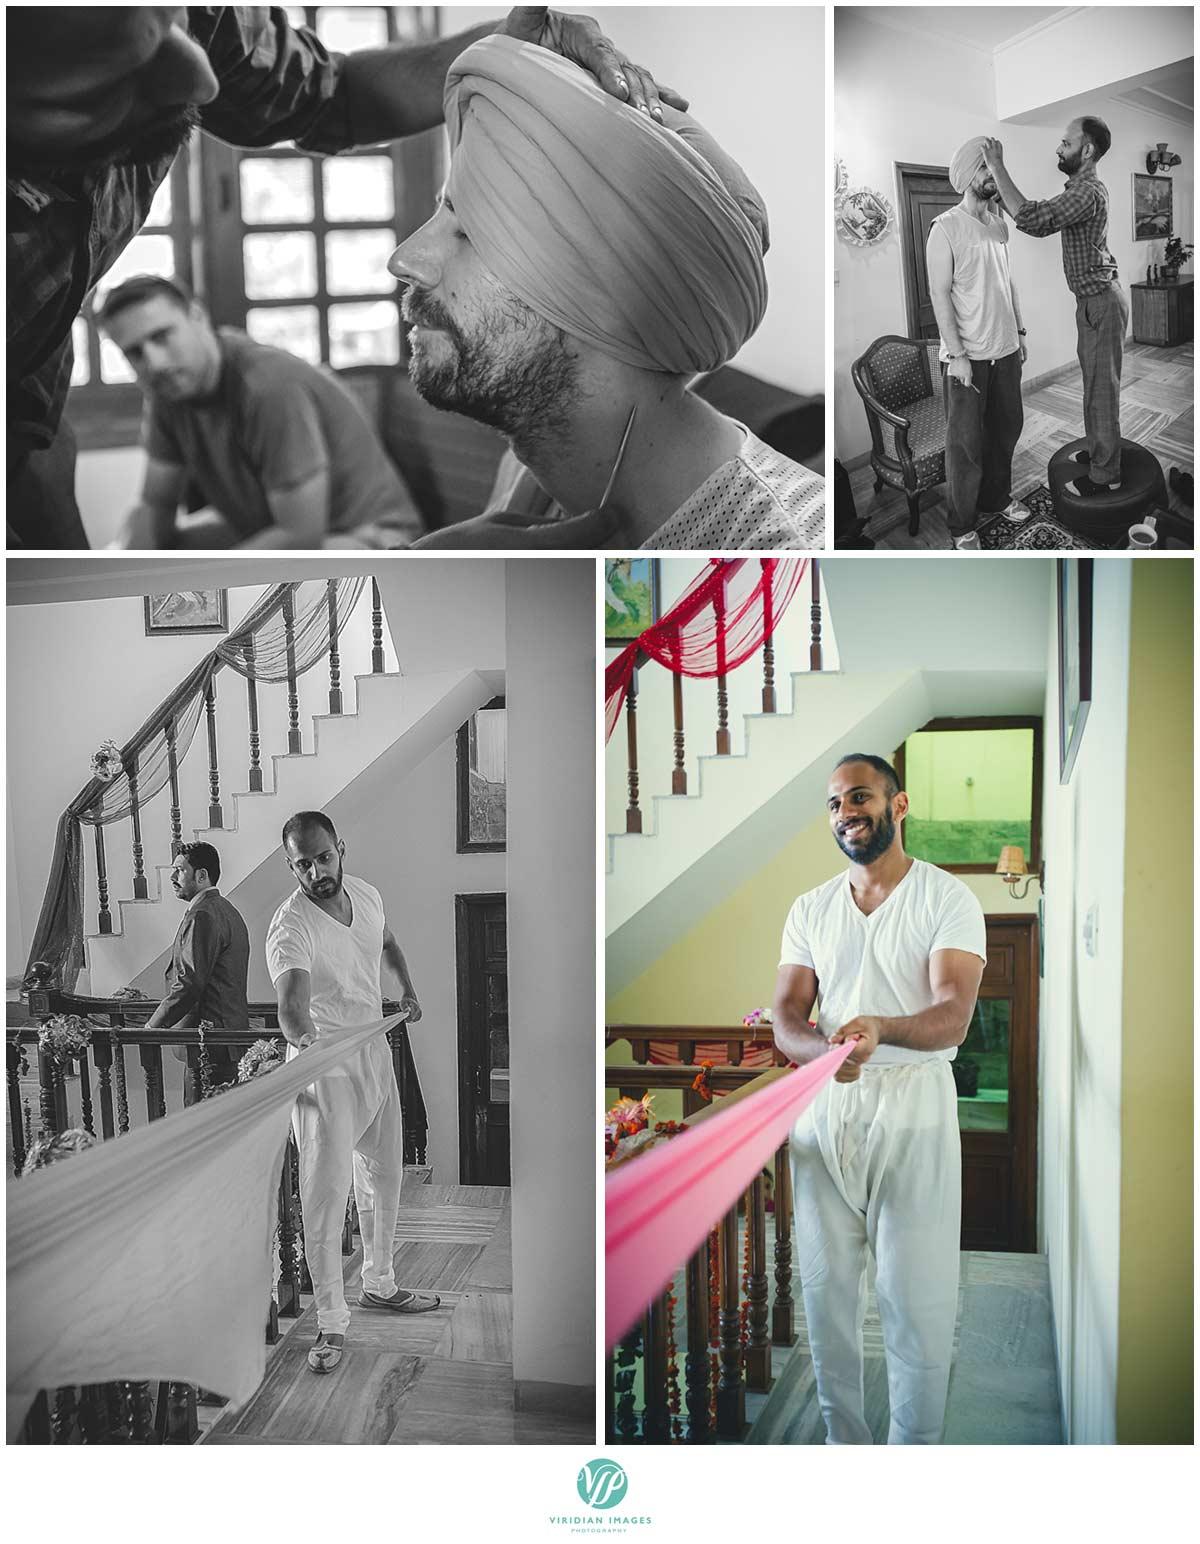 India_Chandigarh_Wedding_Viridian_Images_Photography_poto_8